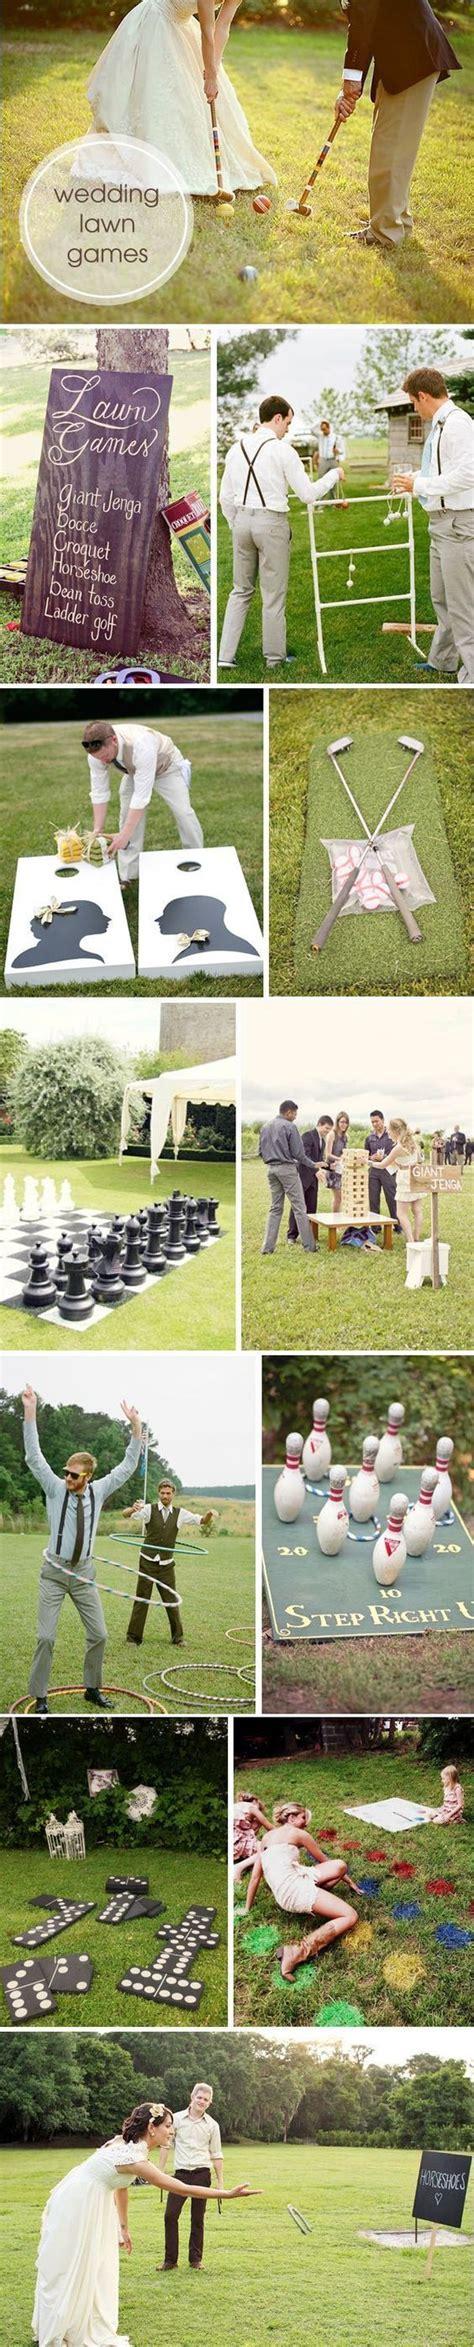 backyard wedding games 45 fun outdoor wedding reception lawn game ideas deer